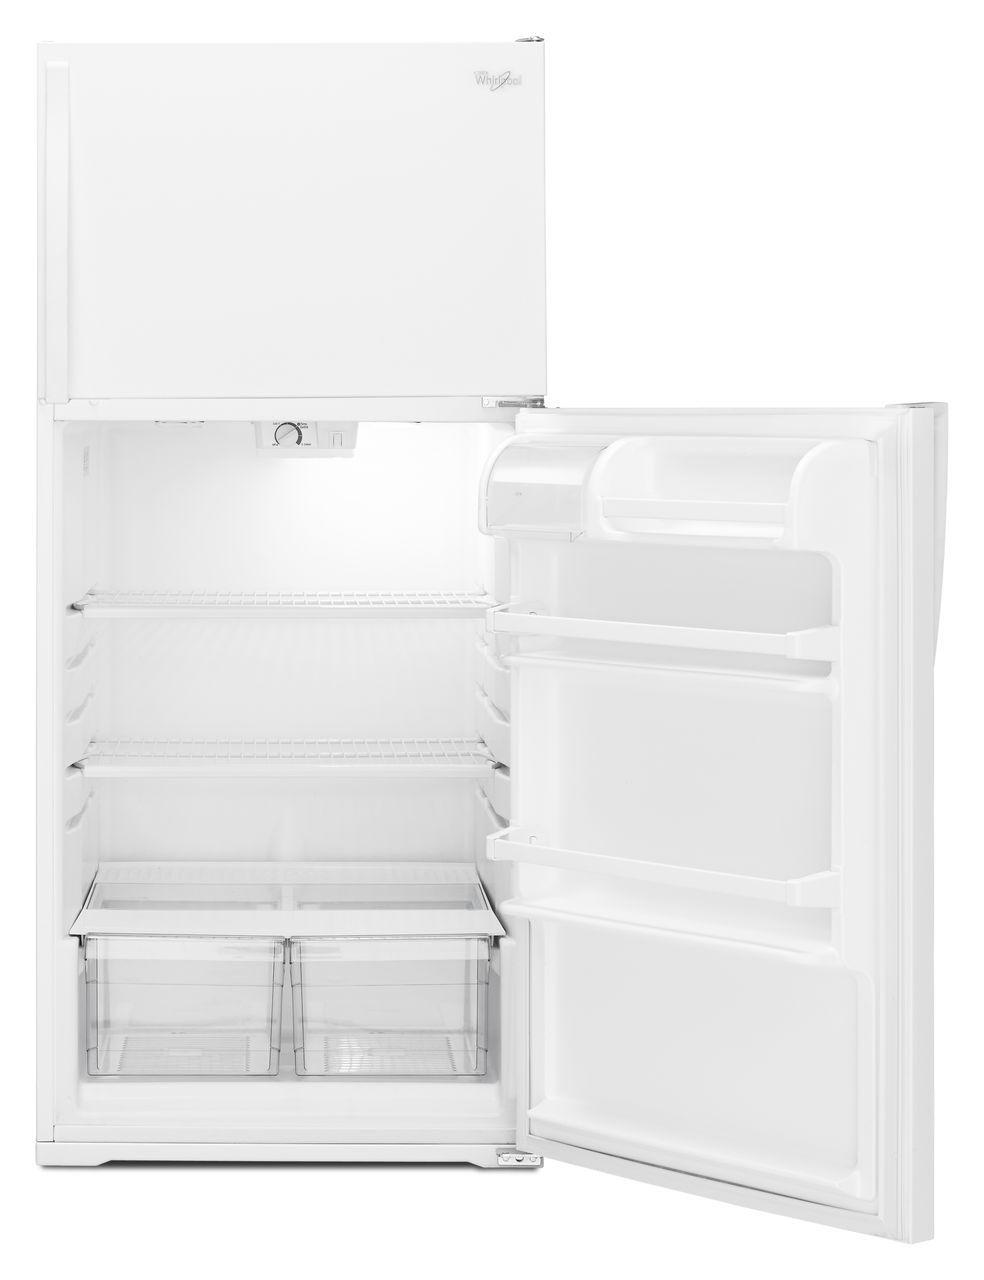 Best Whirlpool Apartment Refrigerator Gallery - Liltigertoo.com ...